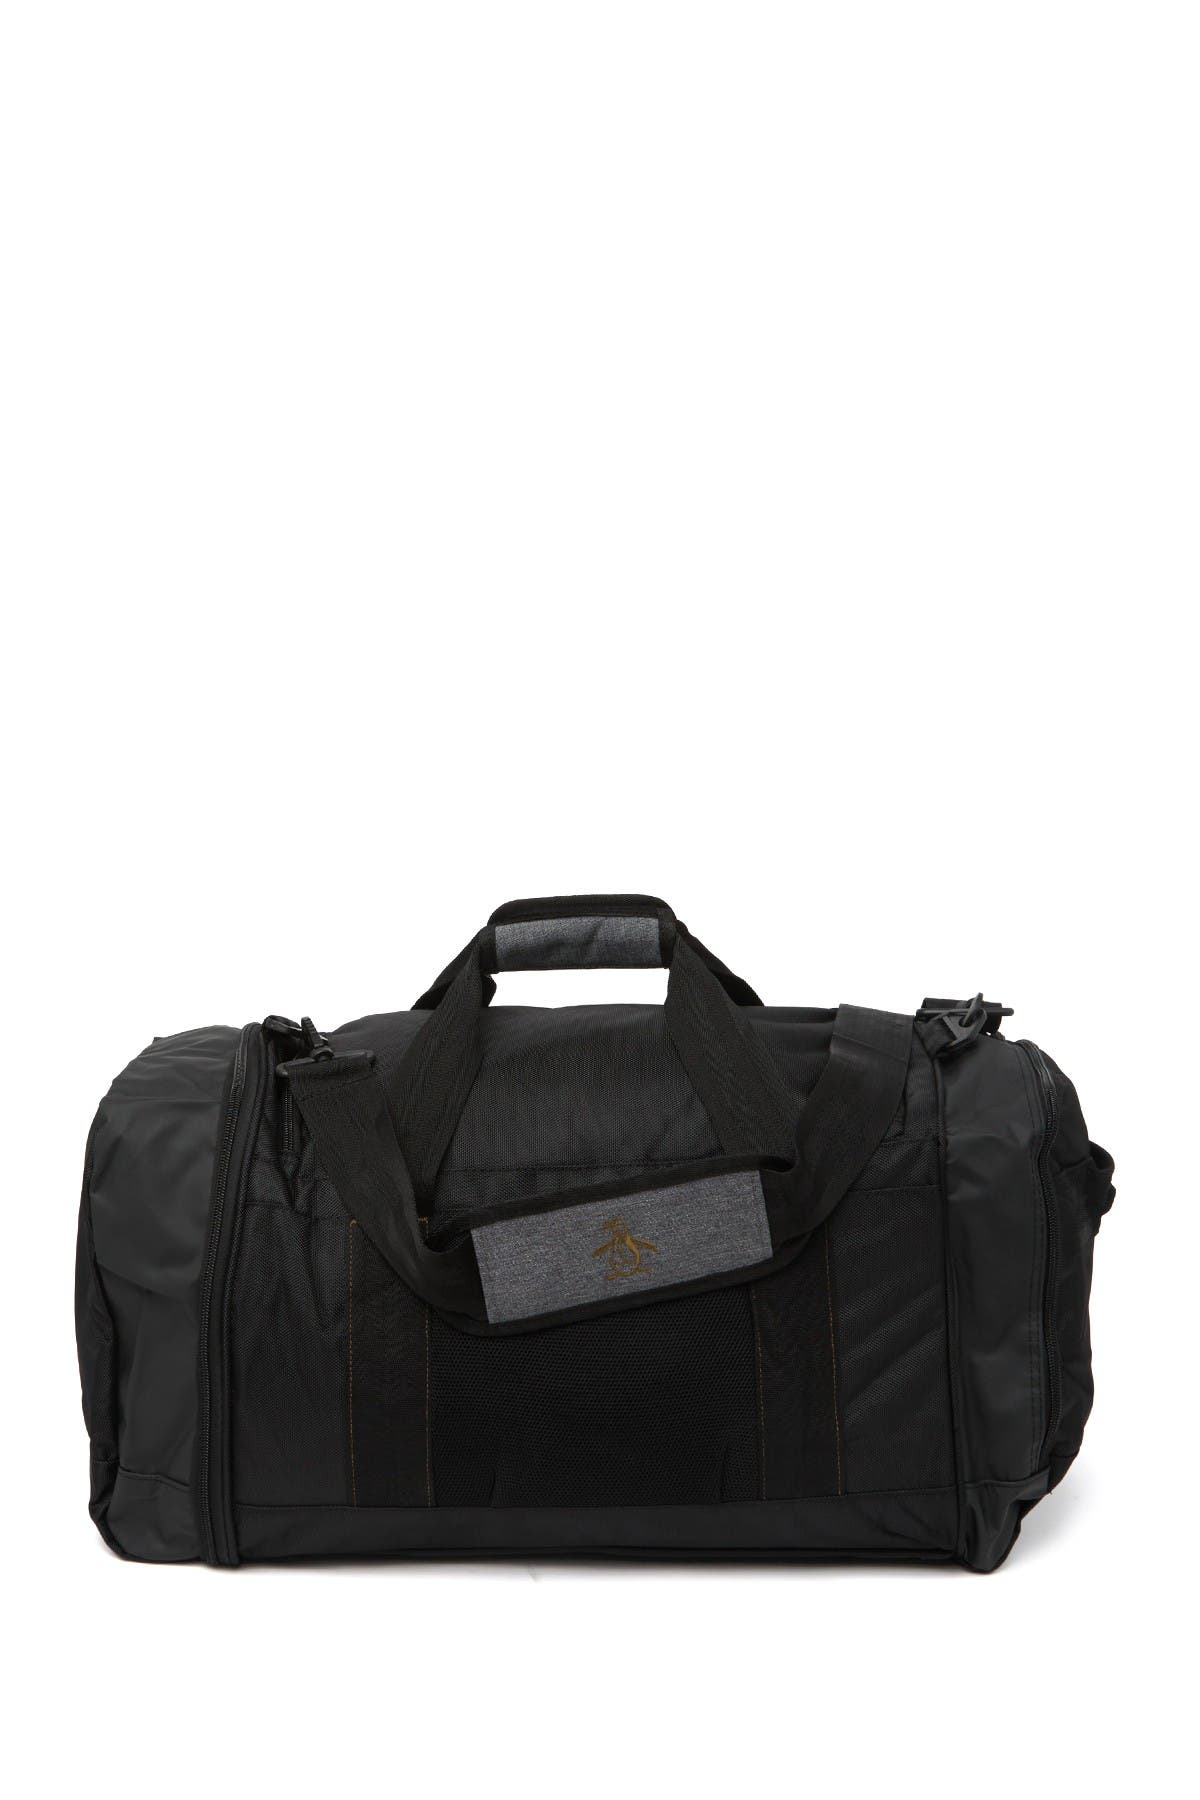 Image of Original Penguin Highfield Duffle Bag